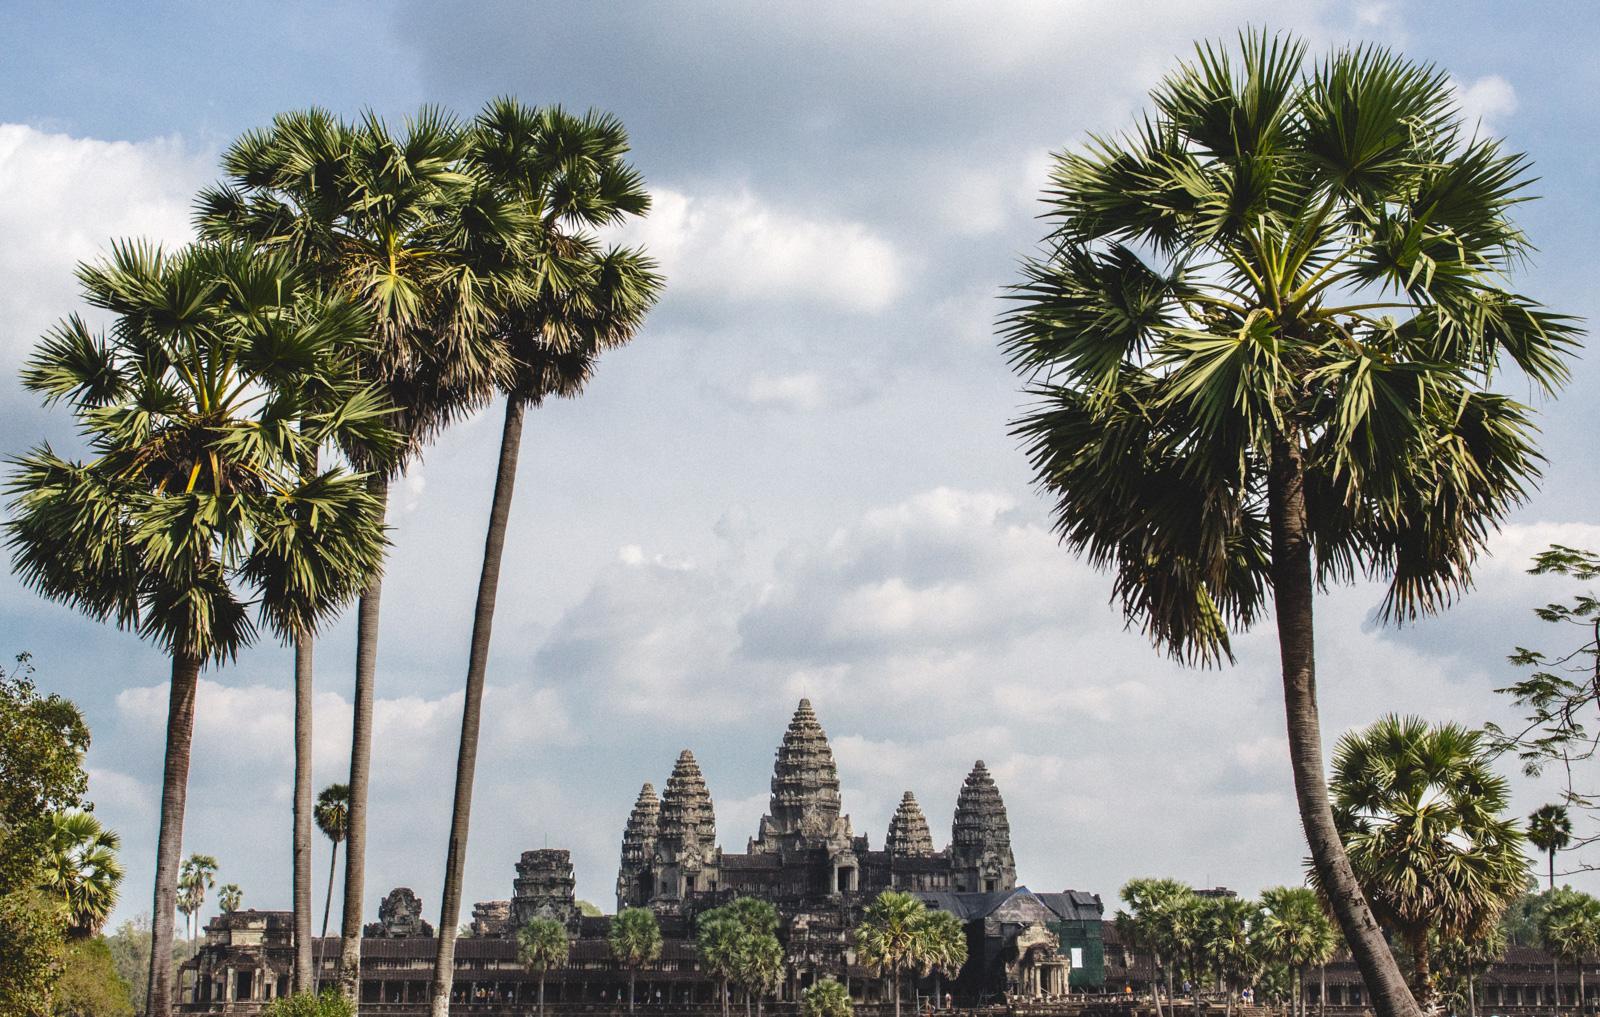 AngkorTemples-SiemReap-Cambodia-AmyRolloPhoto-2-158-Edit-2-Edit.jpg